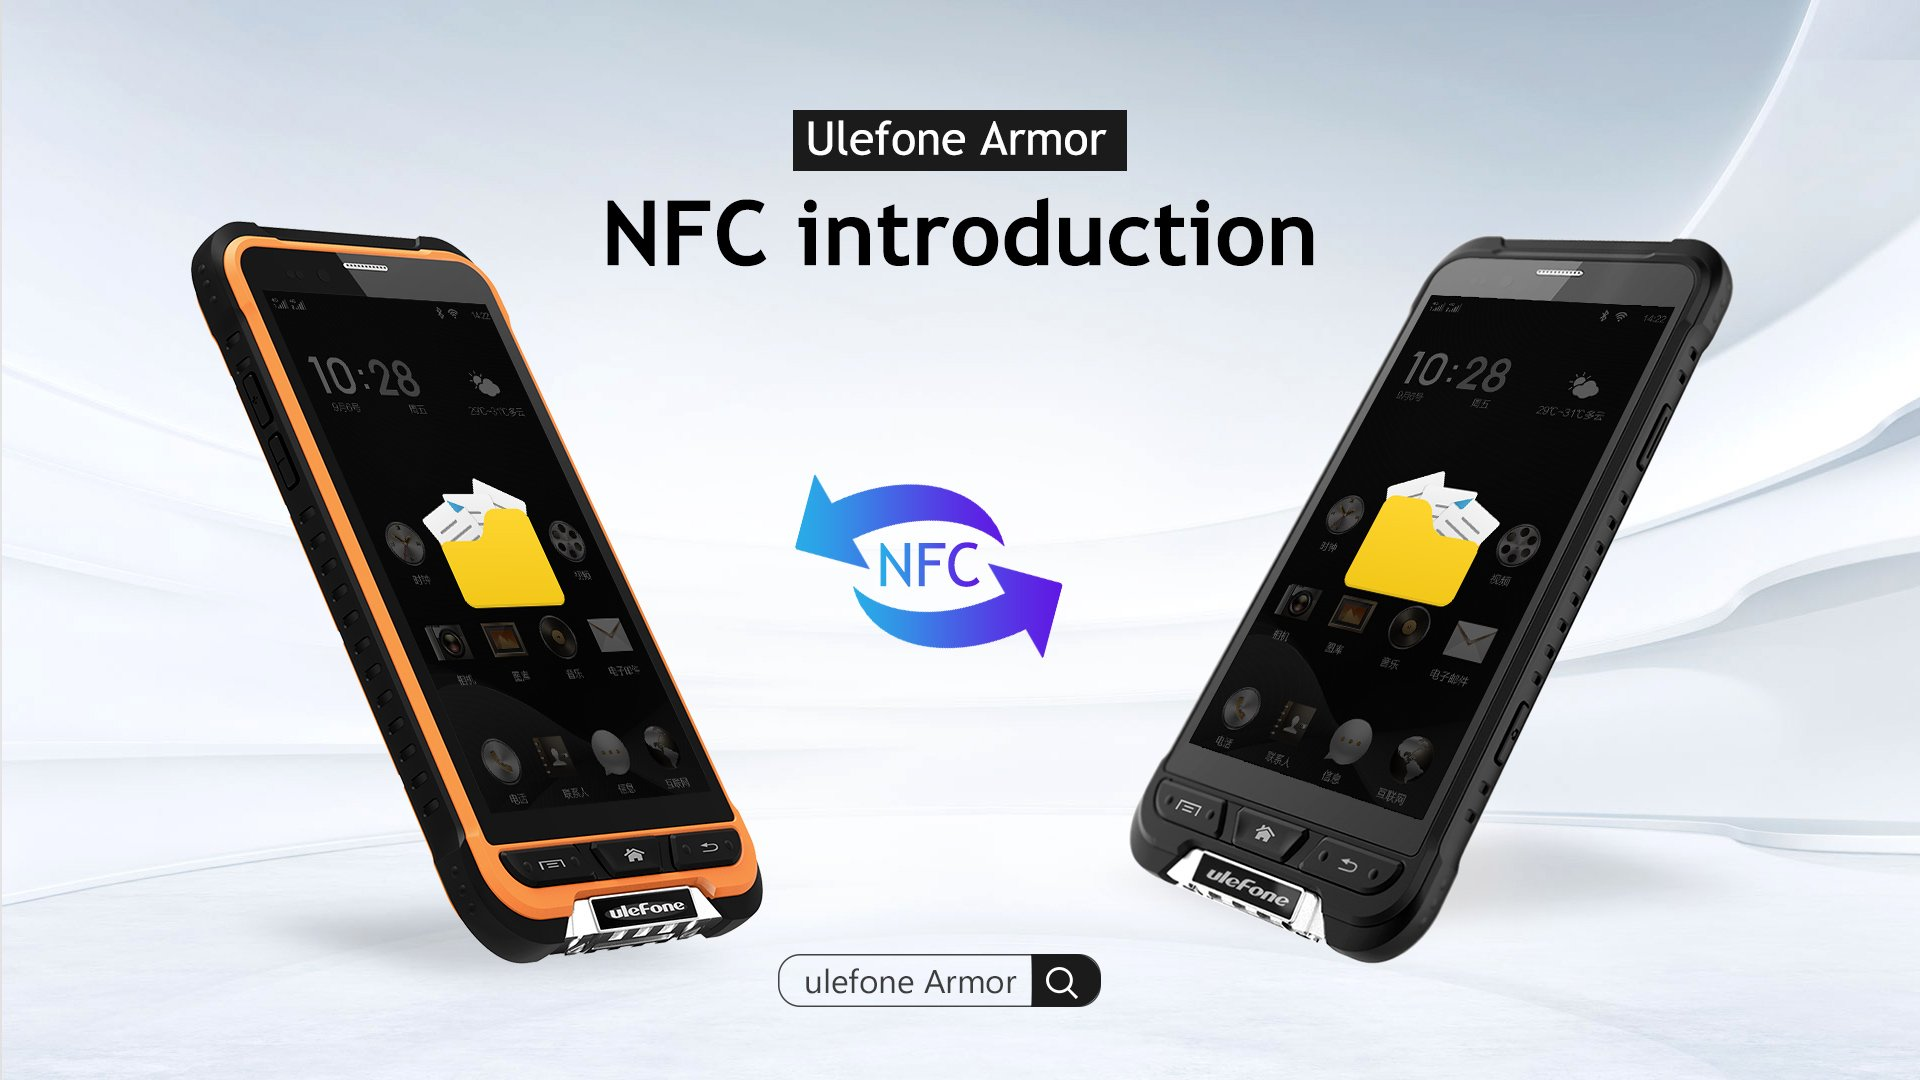 Ulefone Armor NFC